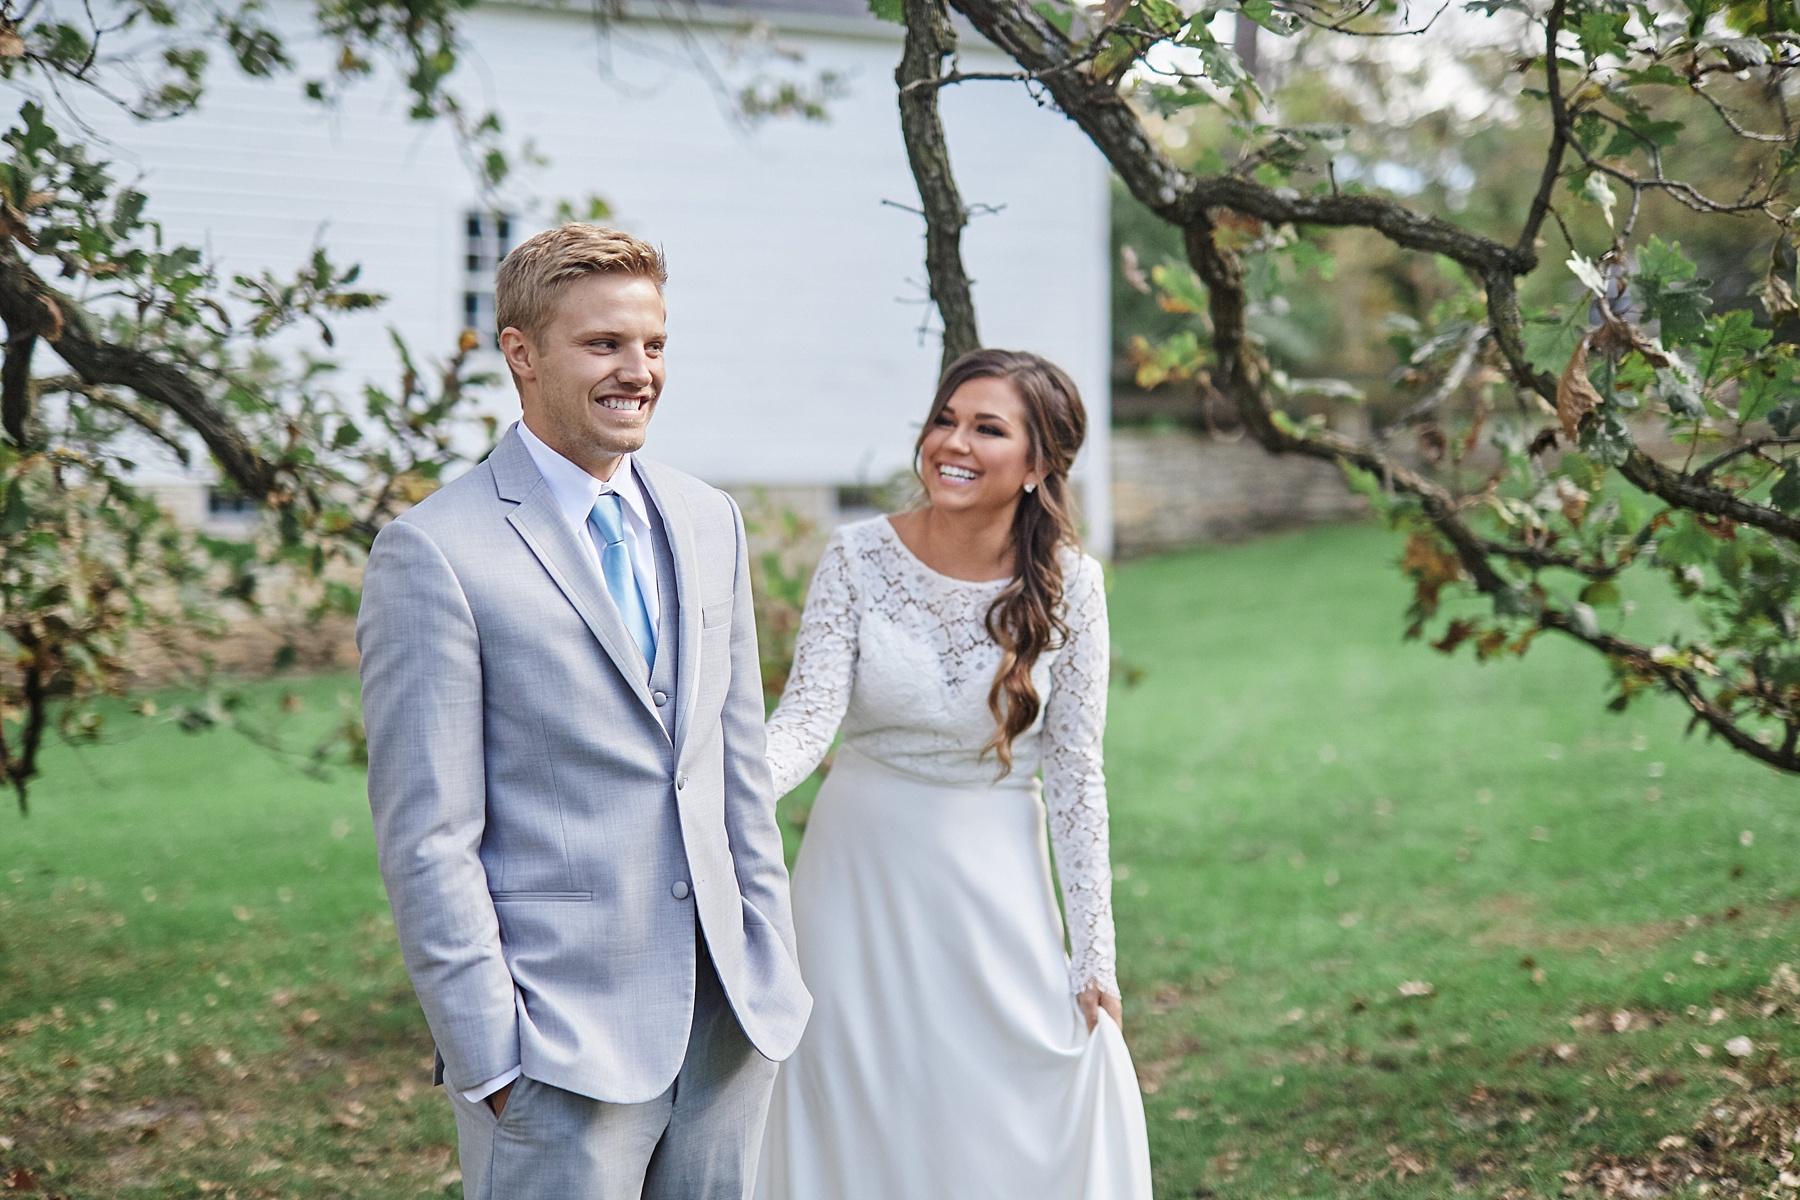 Maywood-Stone-Barn-Wedding-Rochester-Minnesota-Perry-James-Photo_0583.jpg